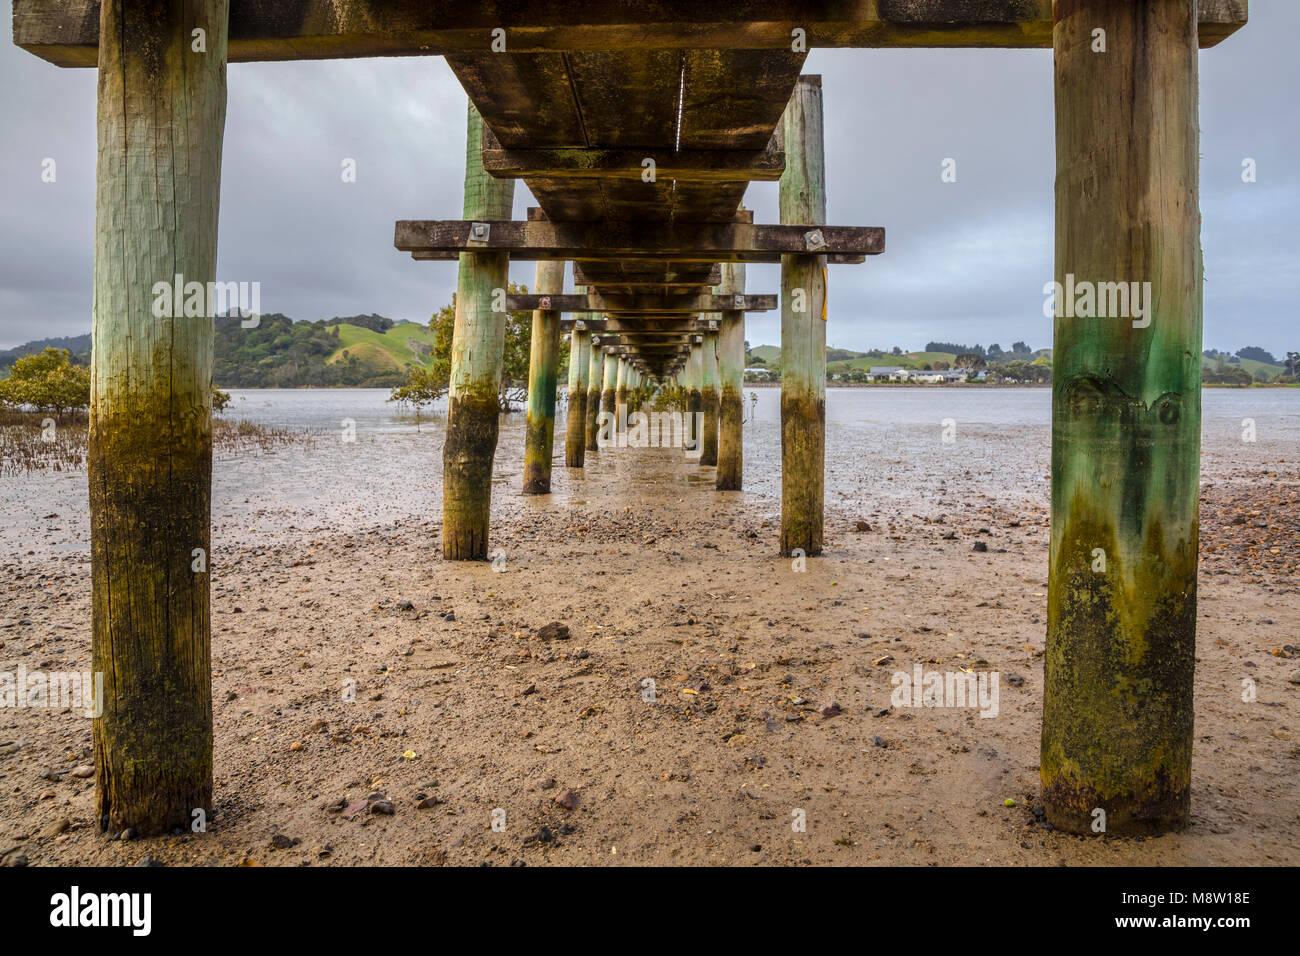 Longest wooden Footbridge in the Southern Hemisphere, Whananaki, New Zealand - Stock Image